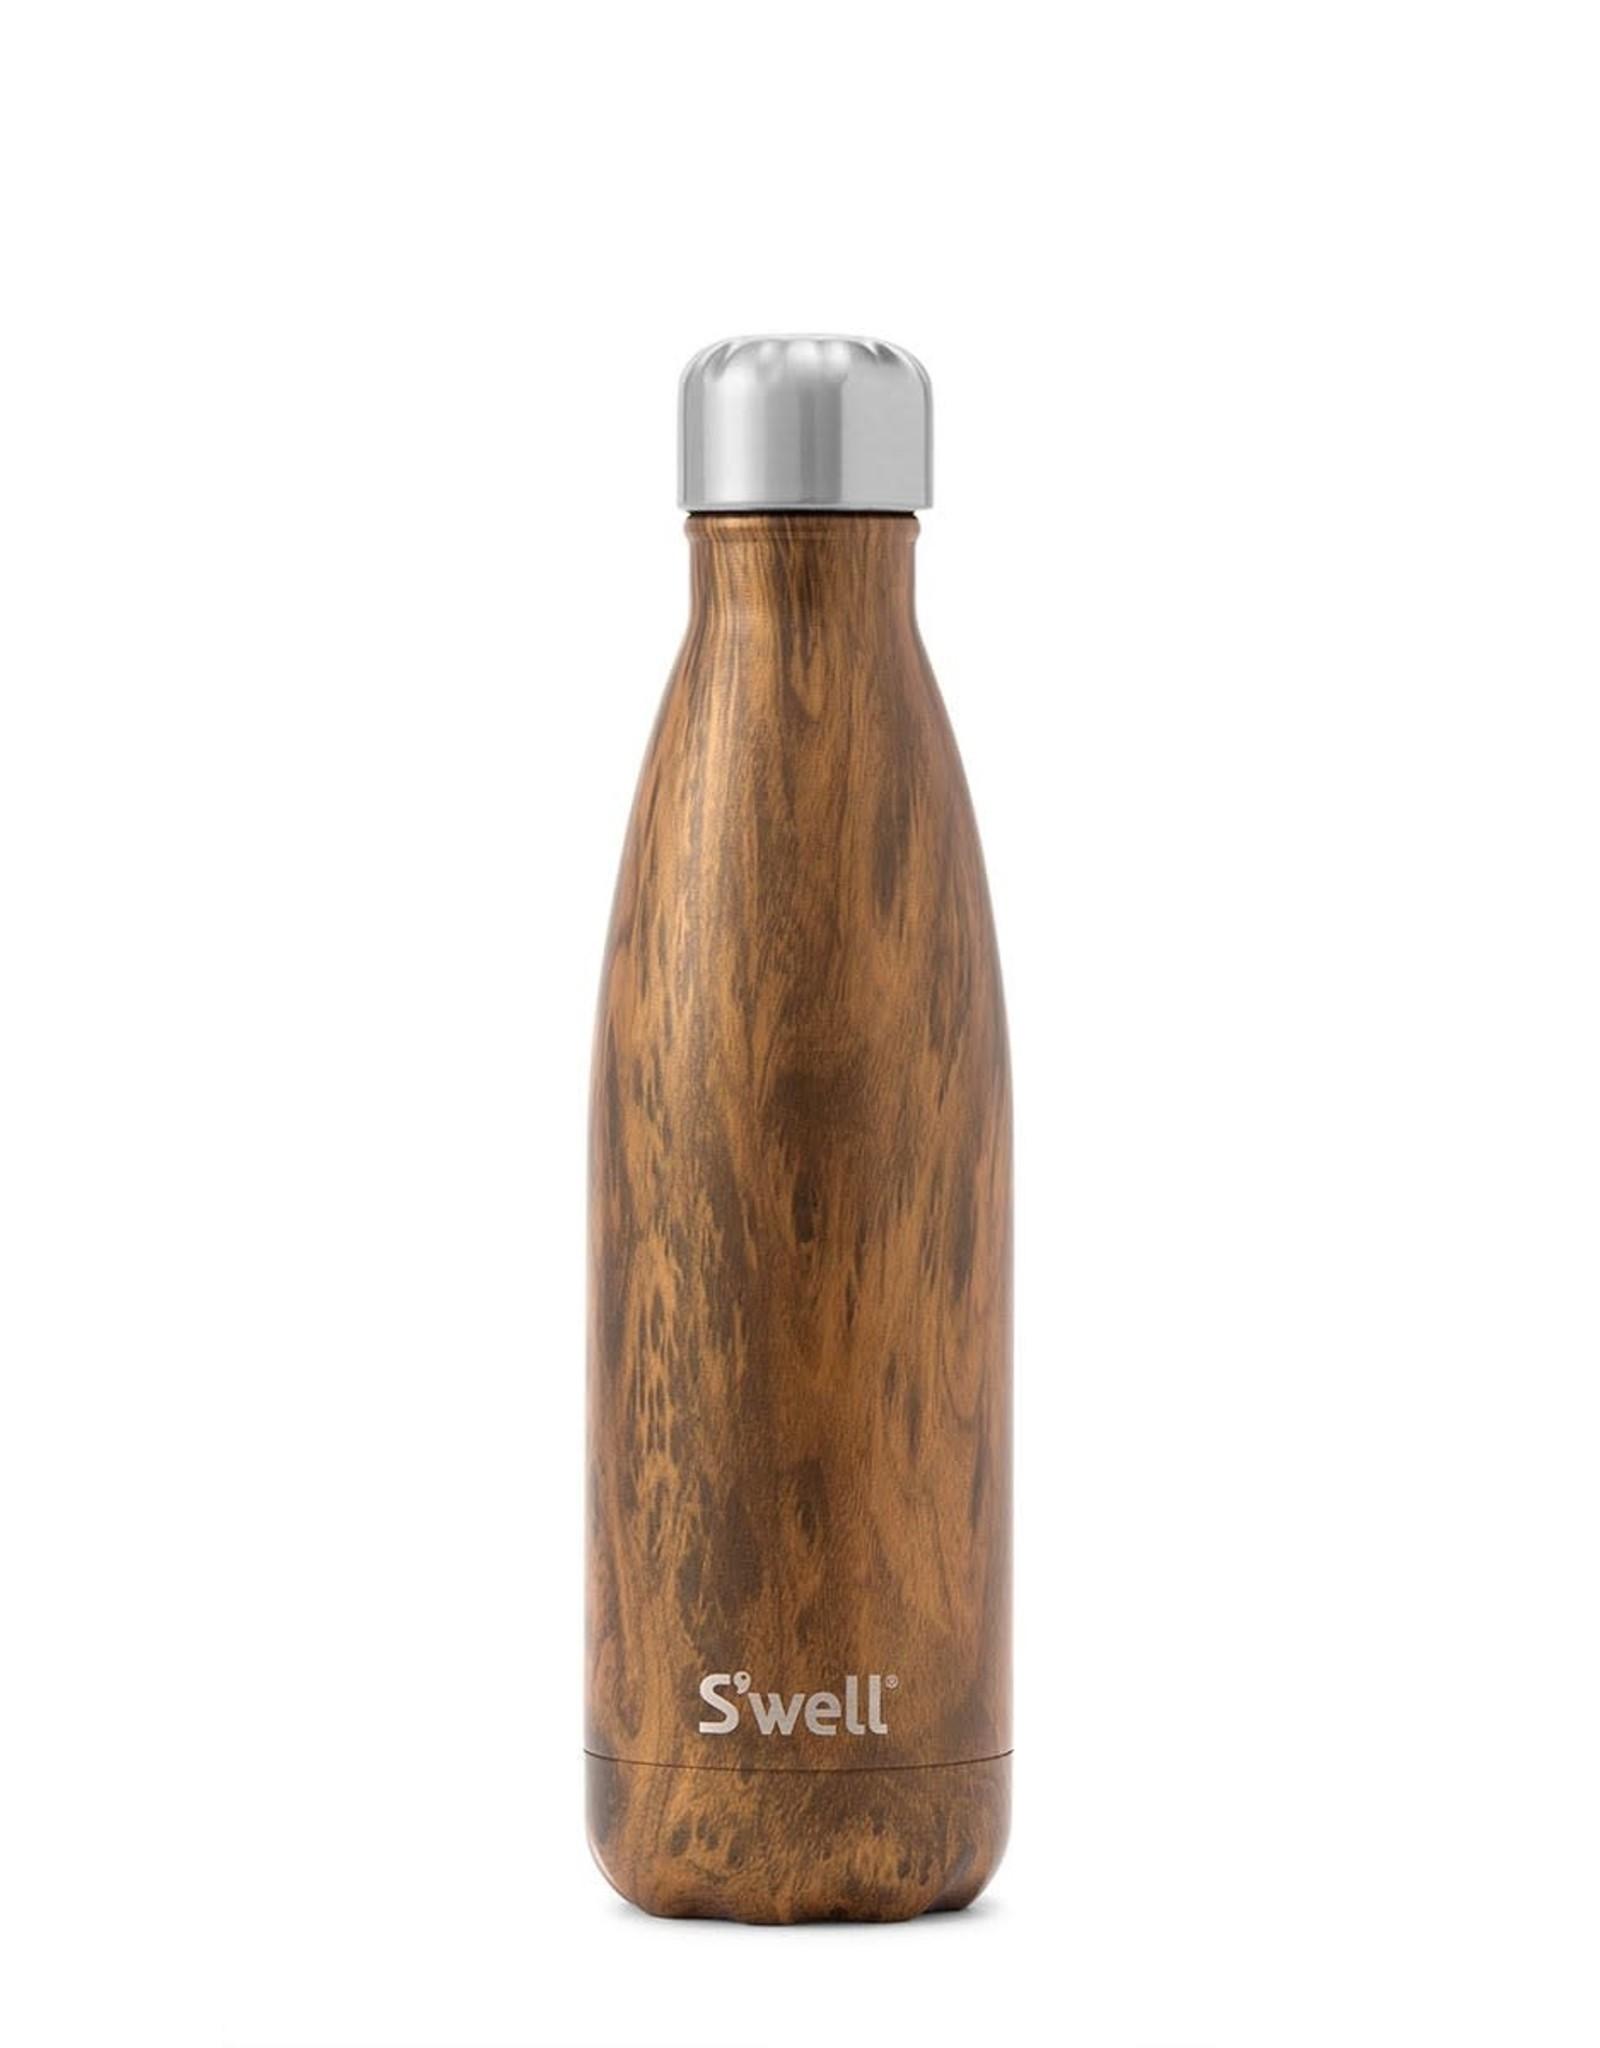 SWELL SWELL Bottle Teak 9 oz.